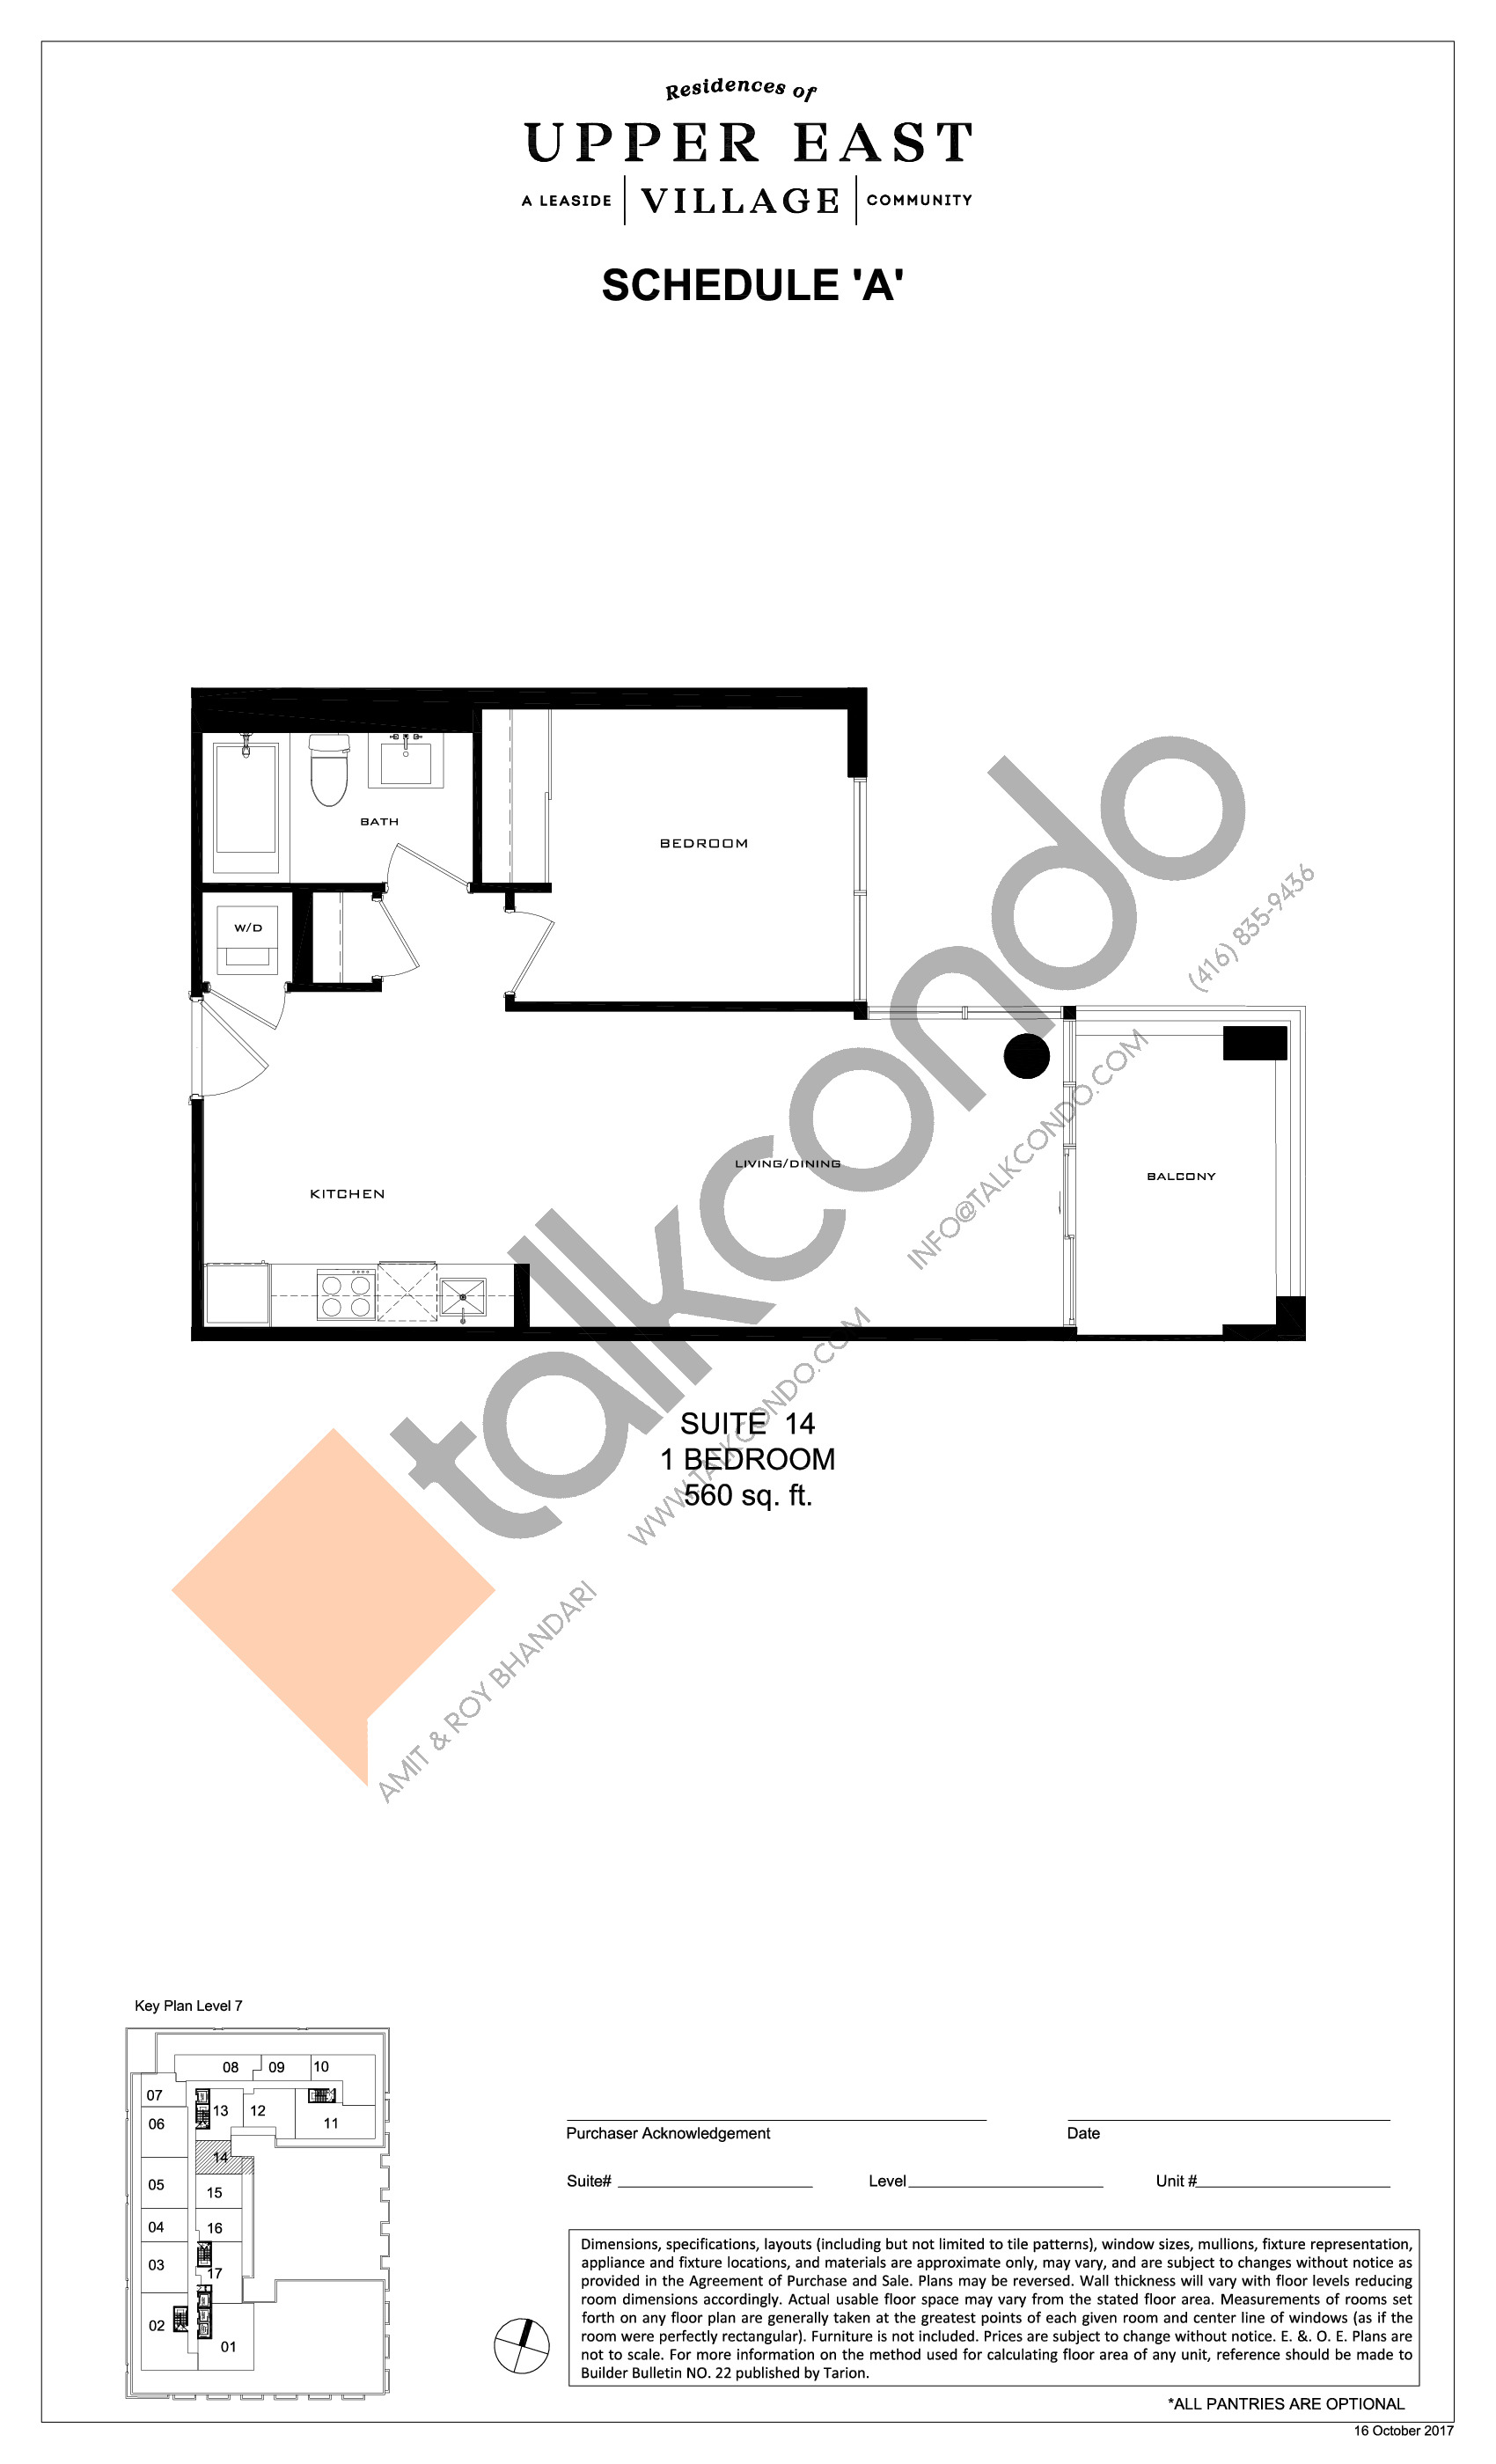 Suite 14 Floor Plan at Upper East Village Condos - 560 sq.ft